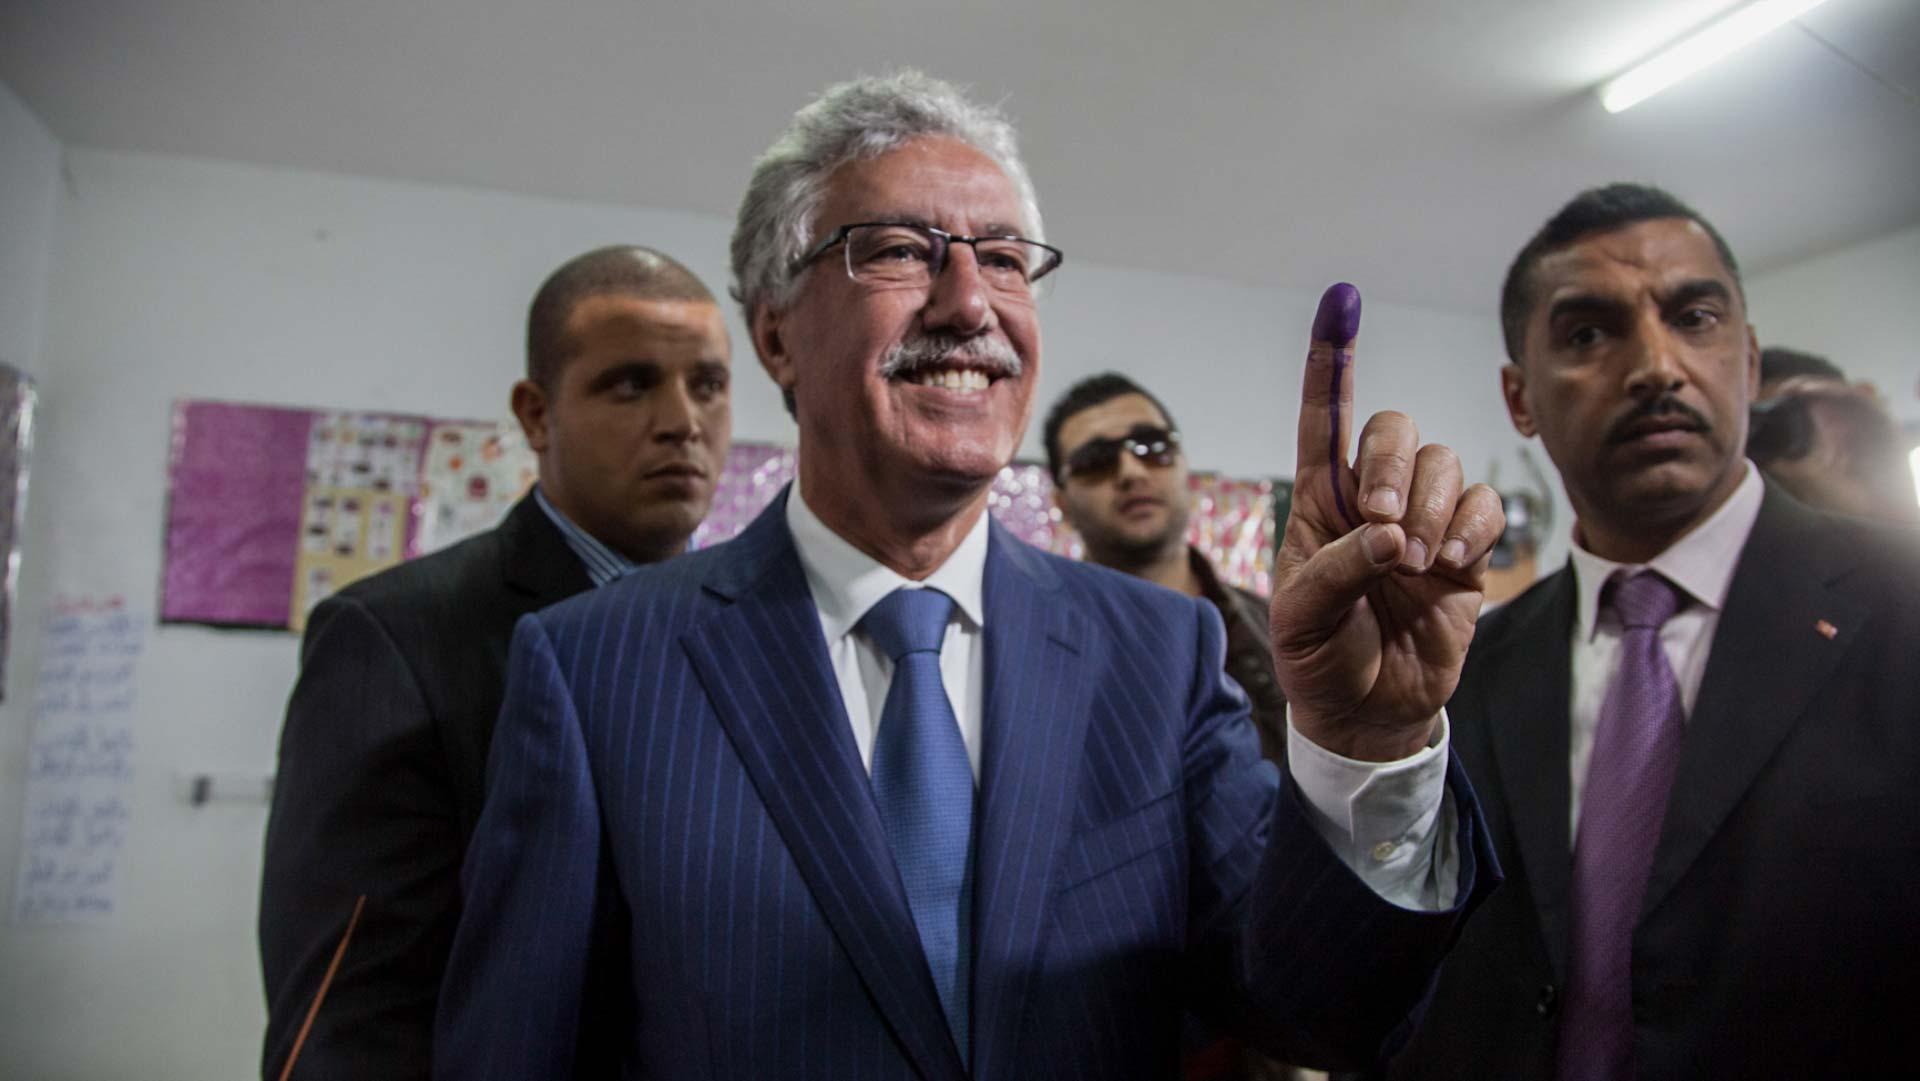 5-tnelec2014-presidentielle-hammami-vote-doigt-1920-inkyfada